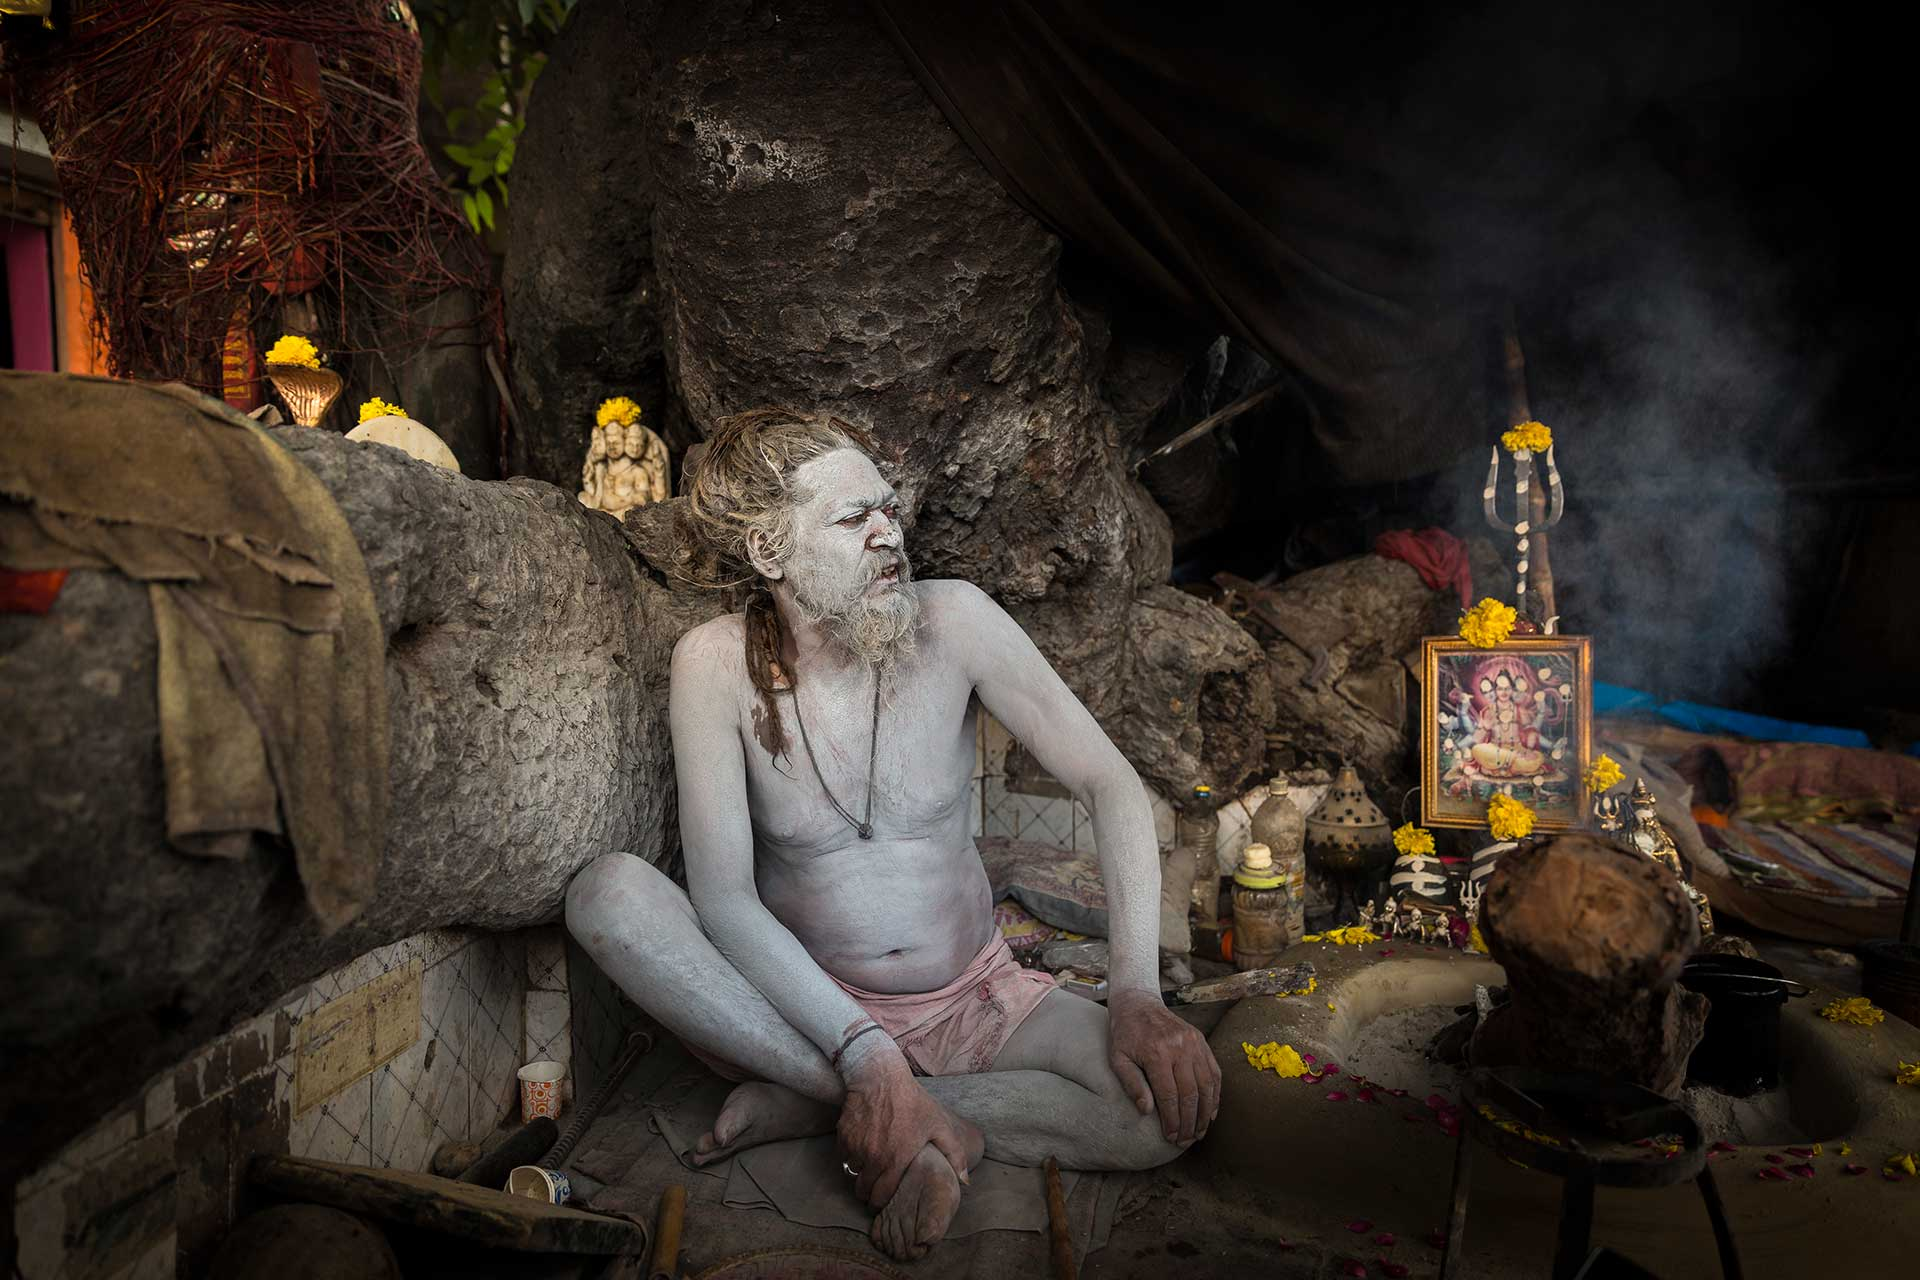 viaje-fotografico-india